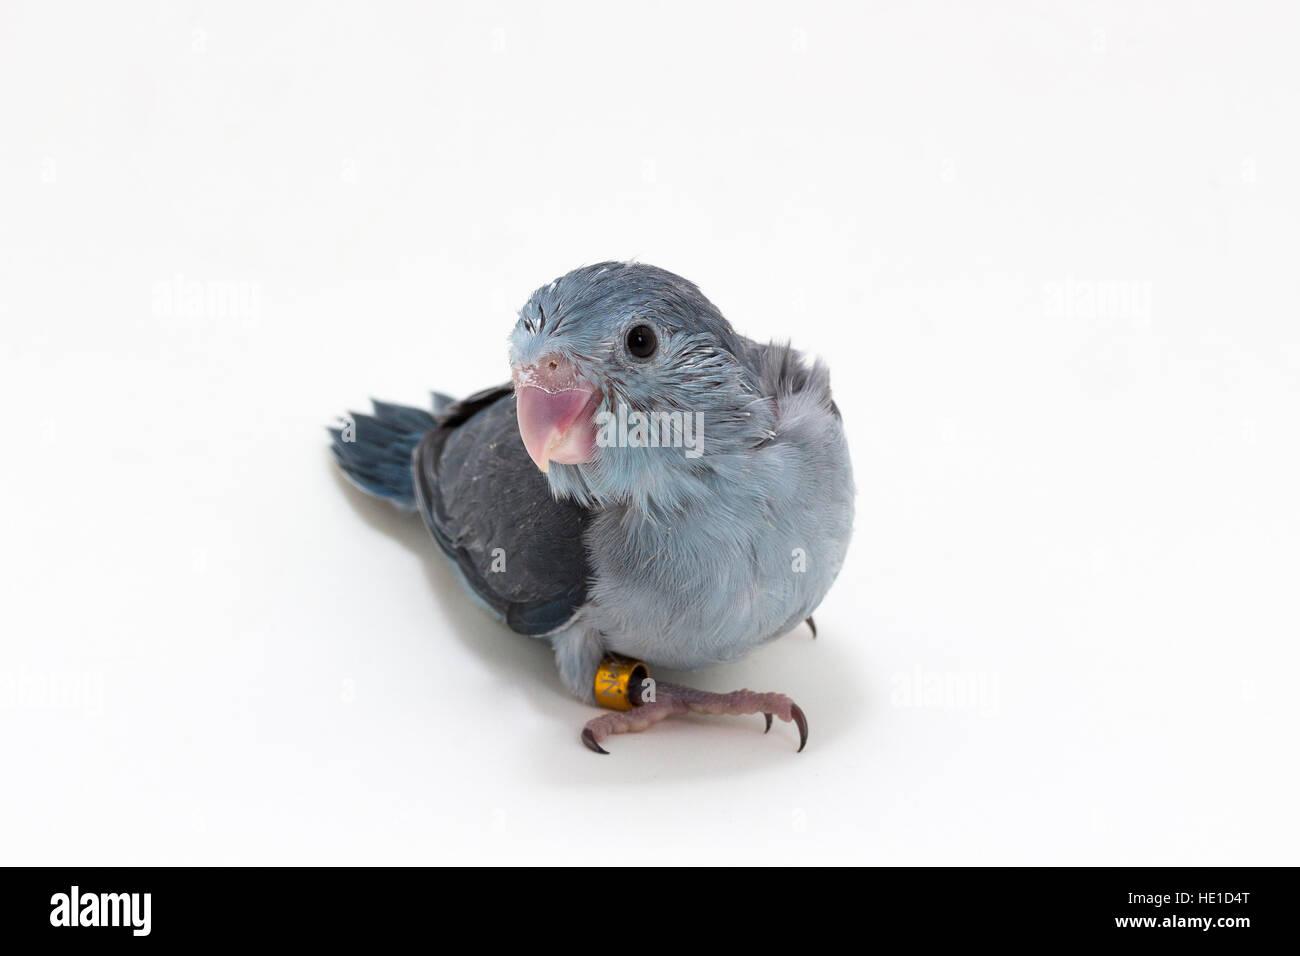 Mauve Forpus's Chick on White Background - Stock Image